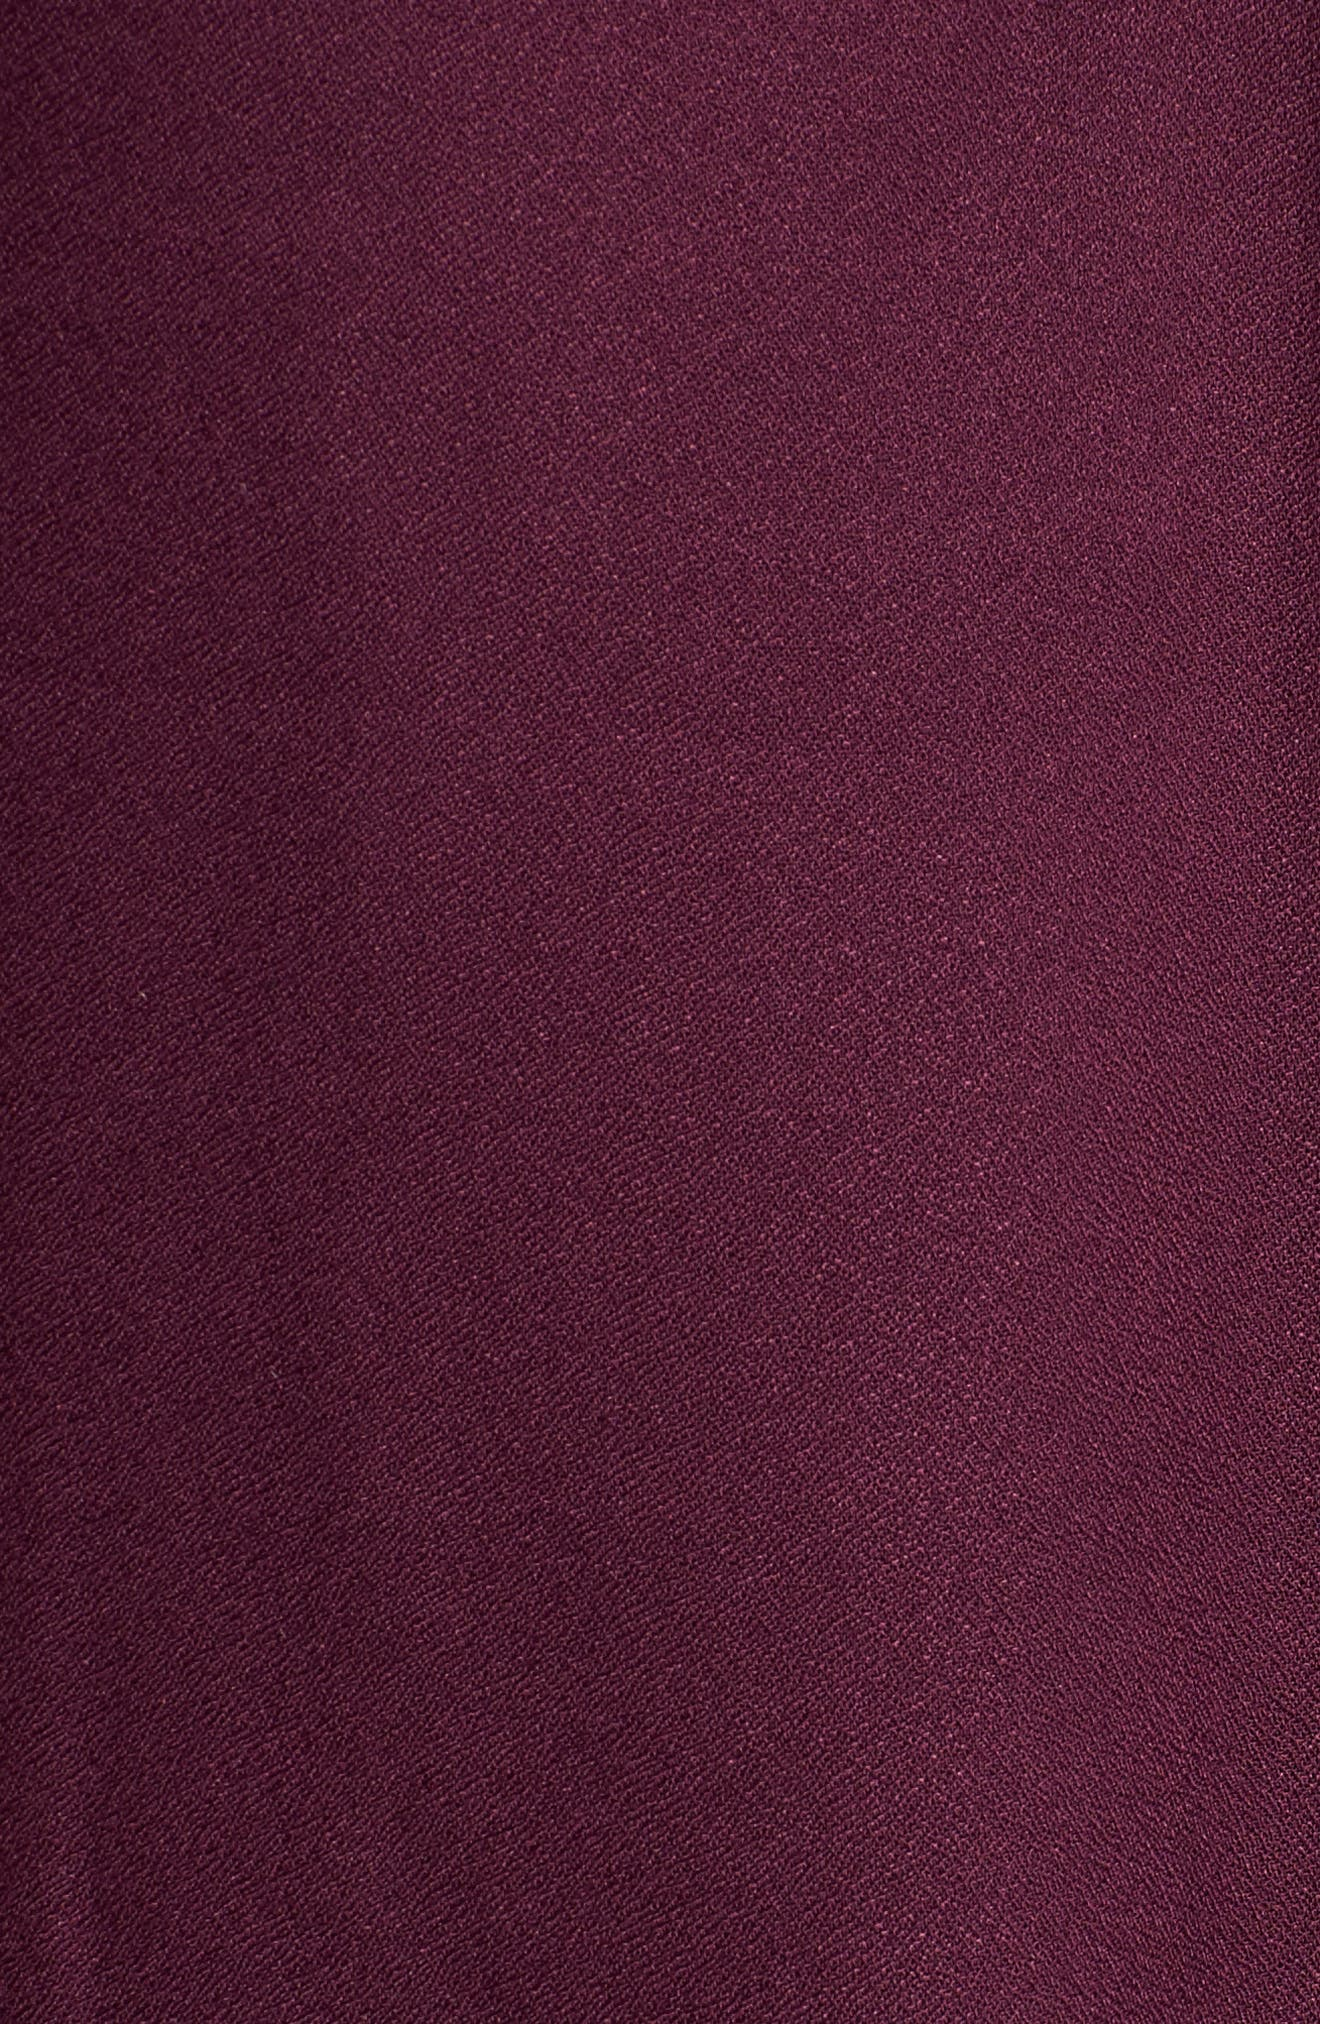 Blouson Sleeve Top,                             Alternate thumbnail 5, color,                             Purple Potent